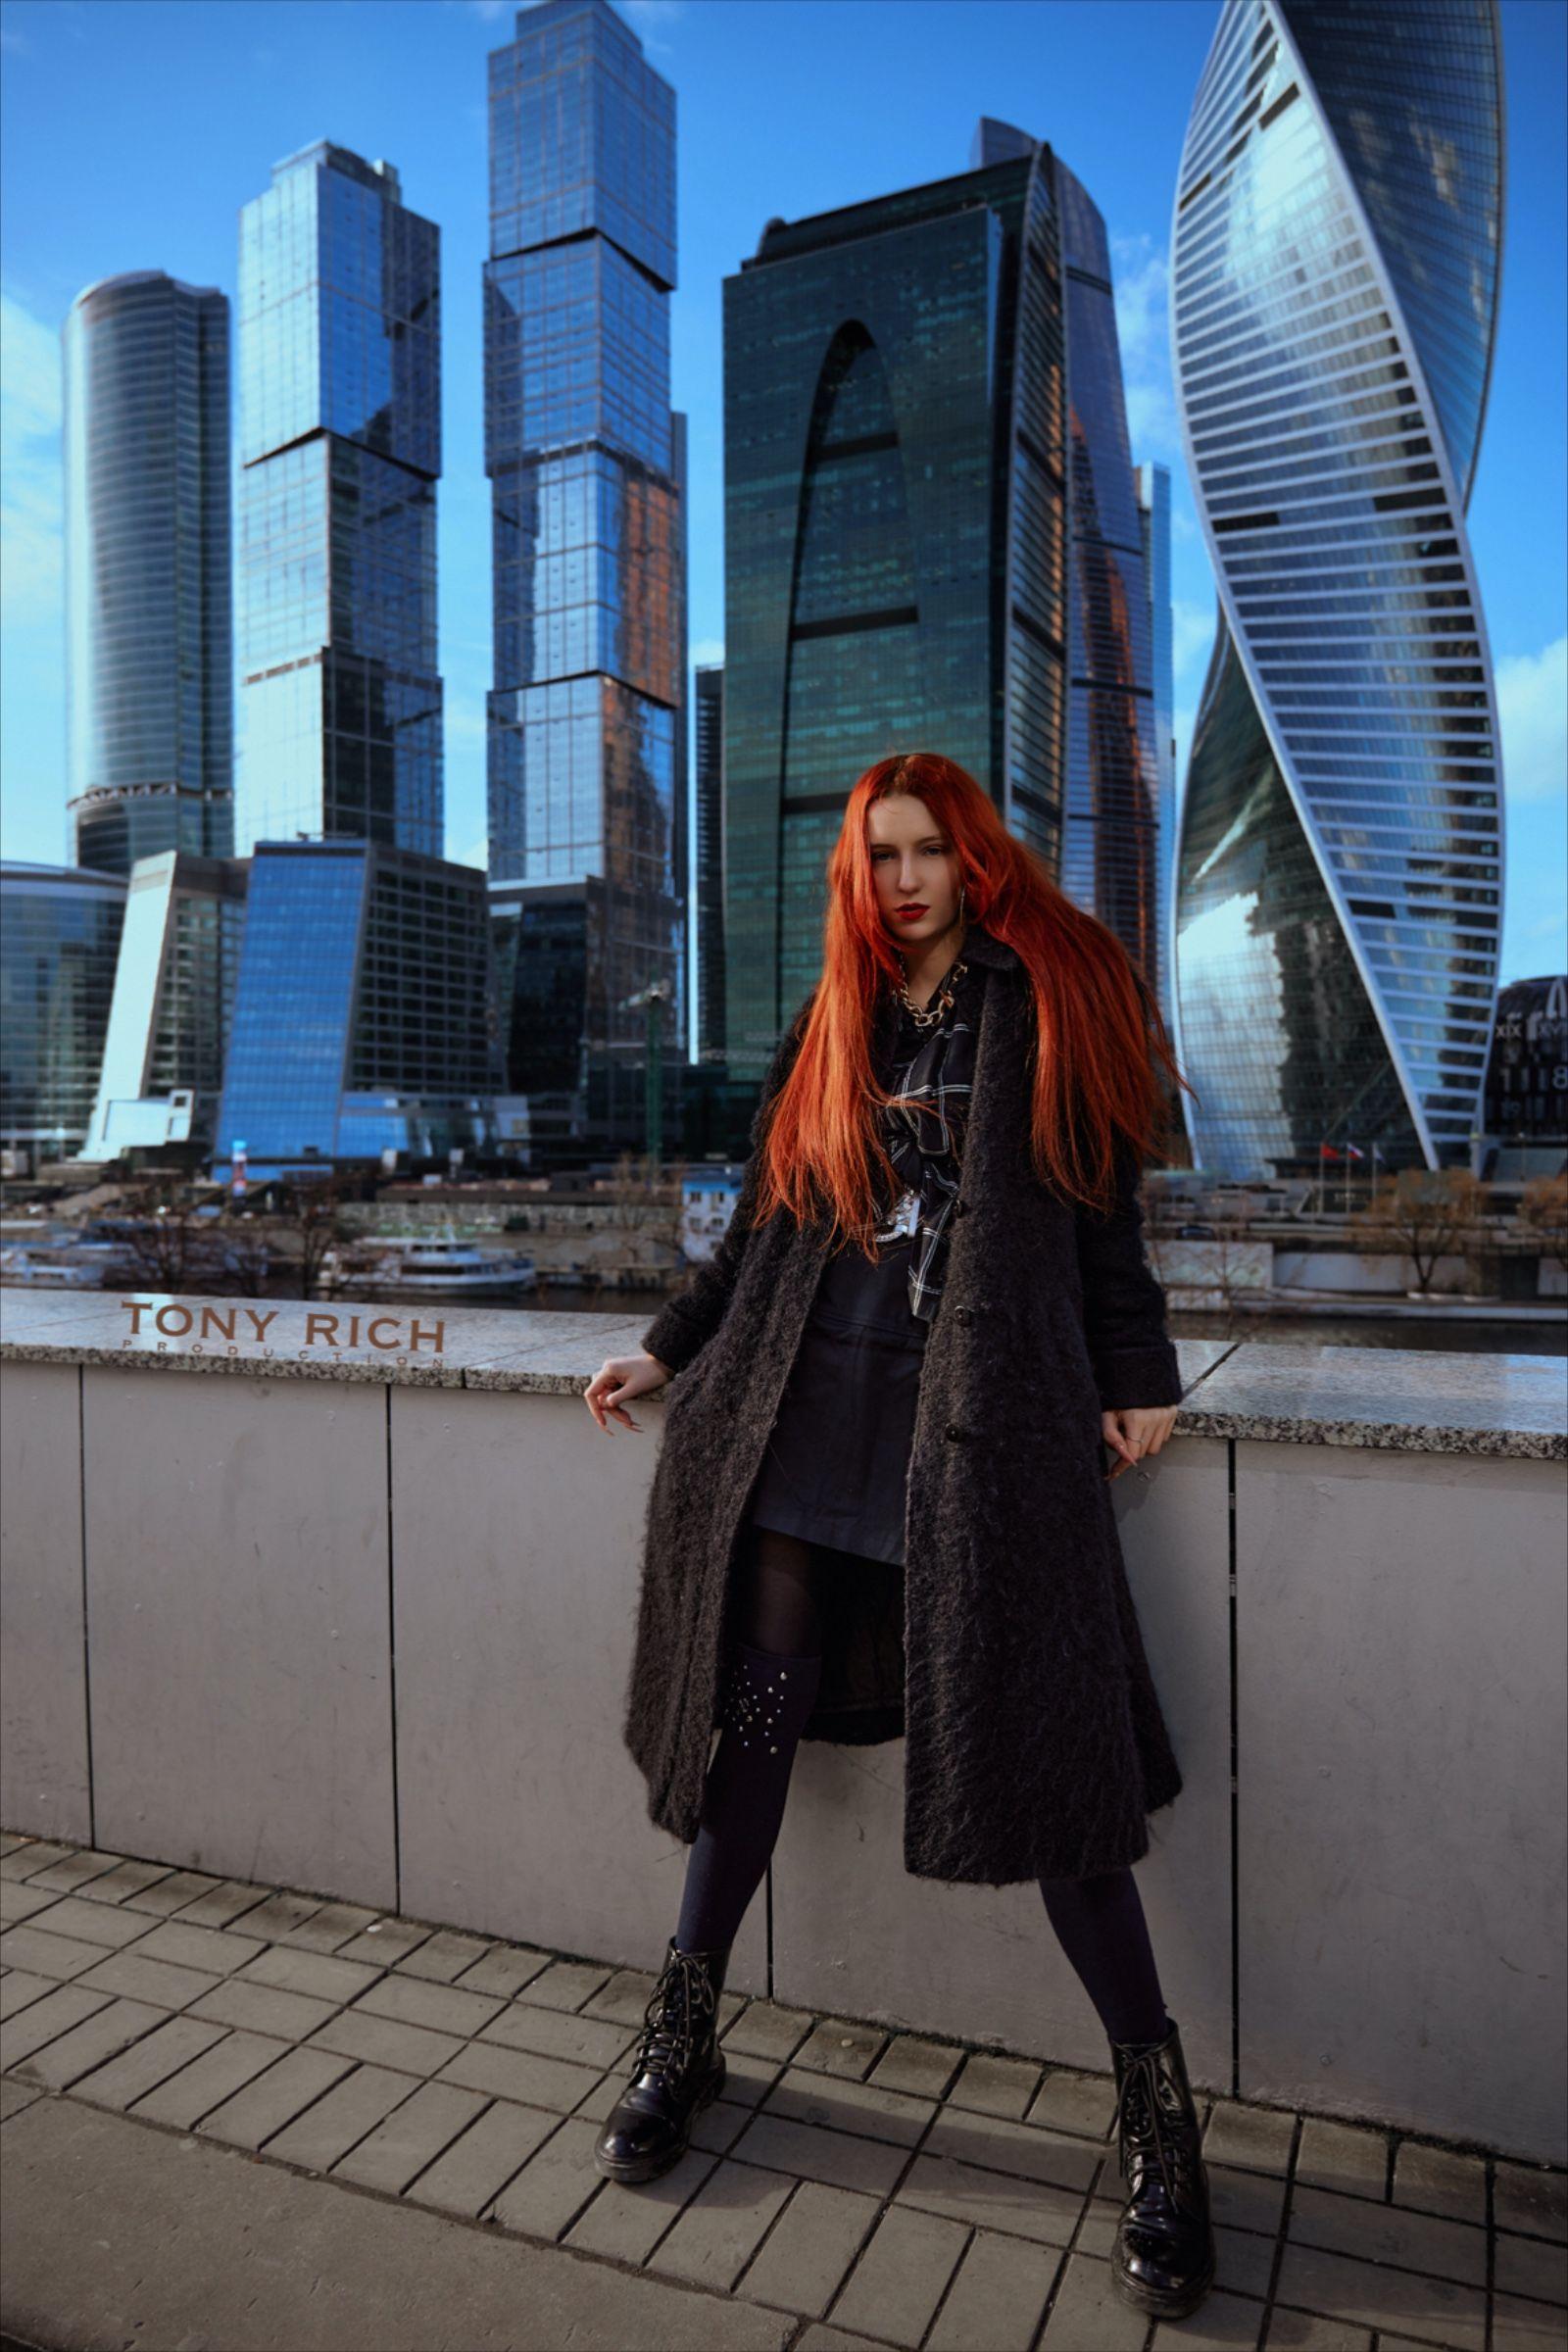 Москва сити фотосессия имена девушек и их работа